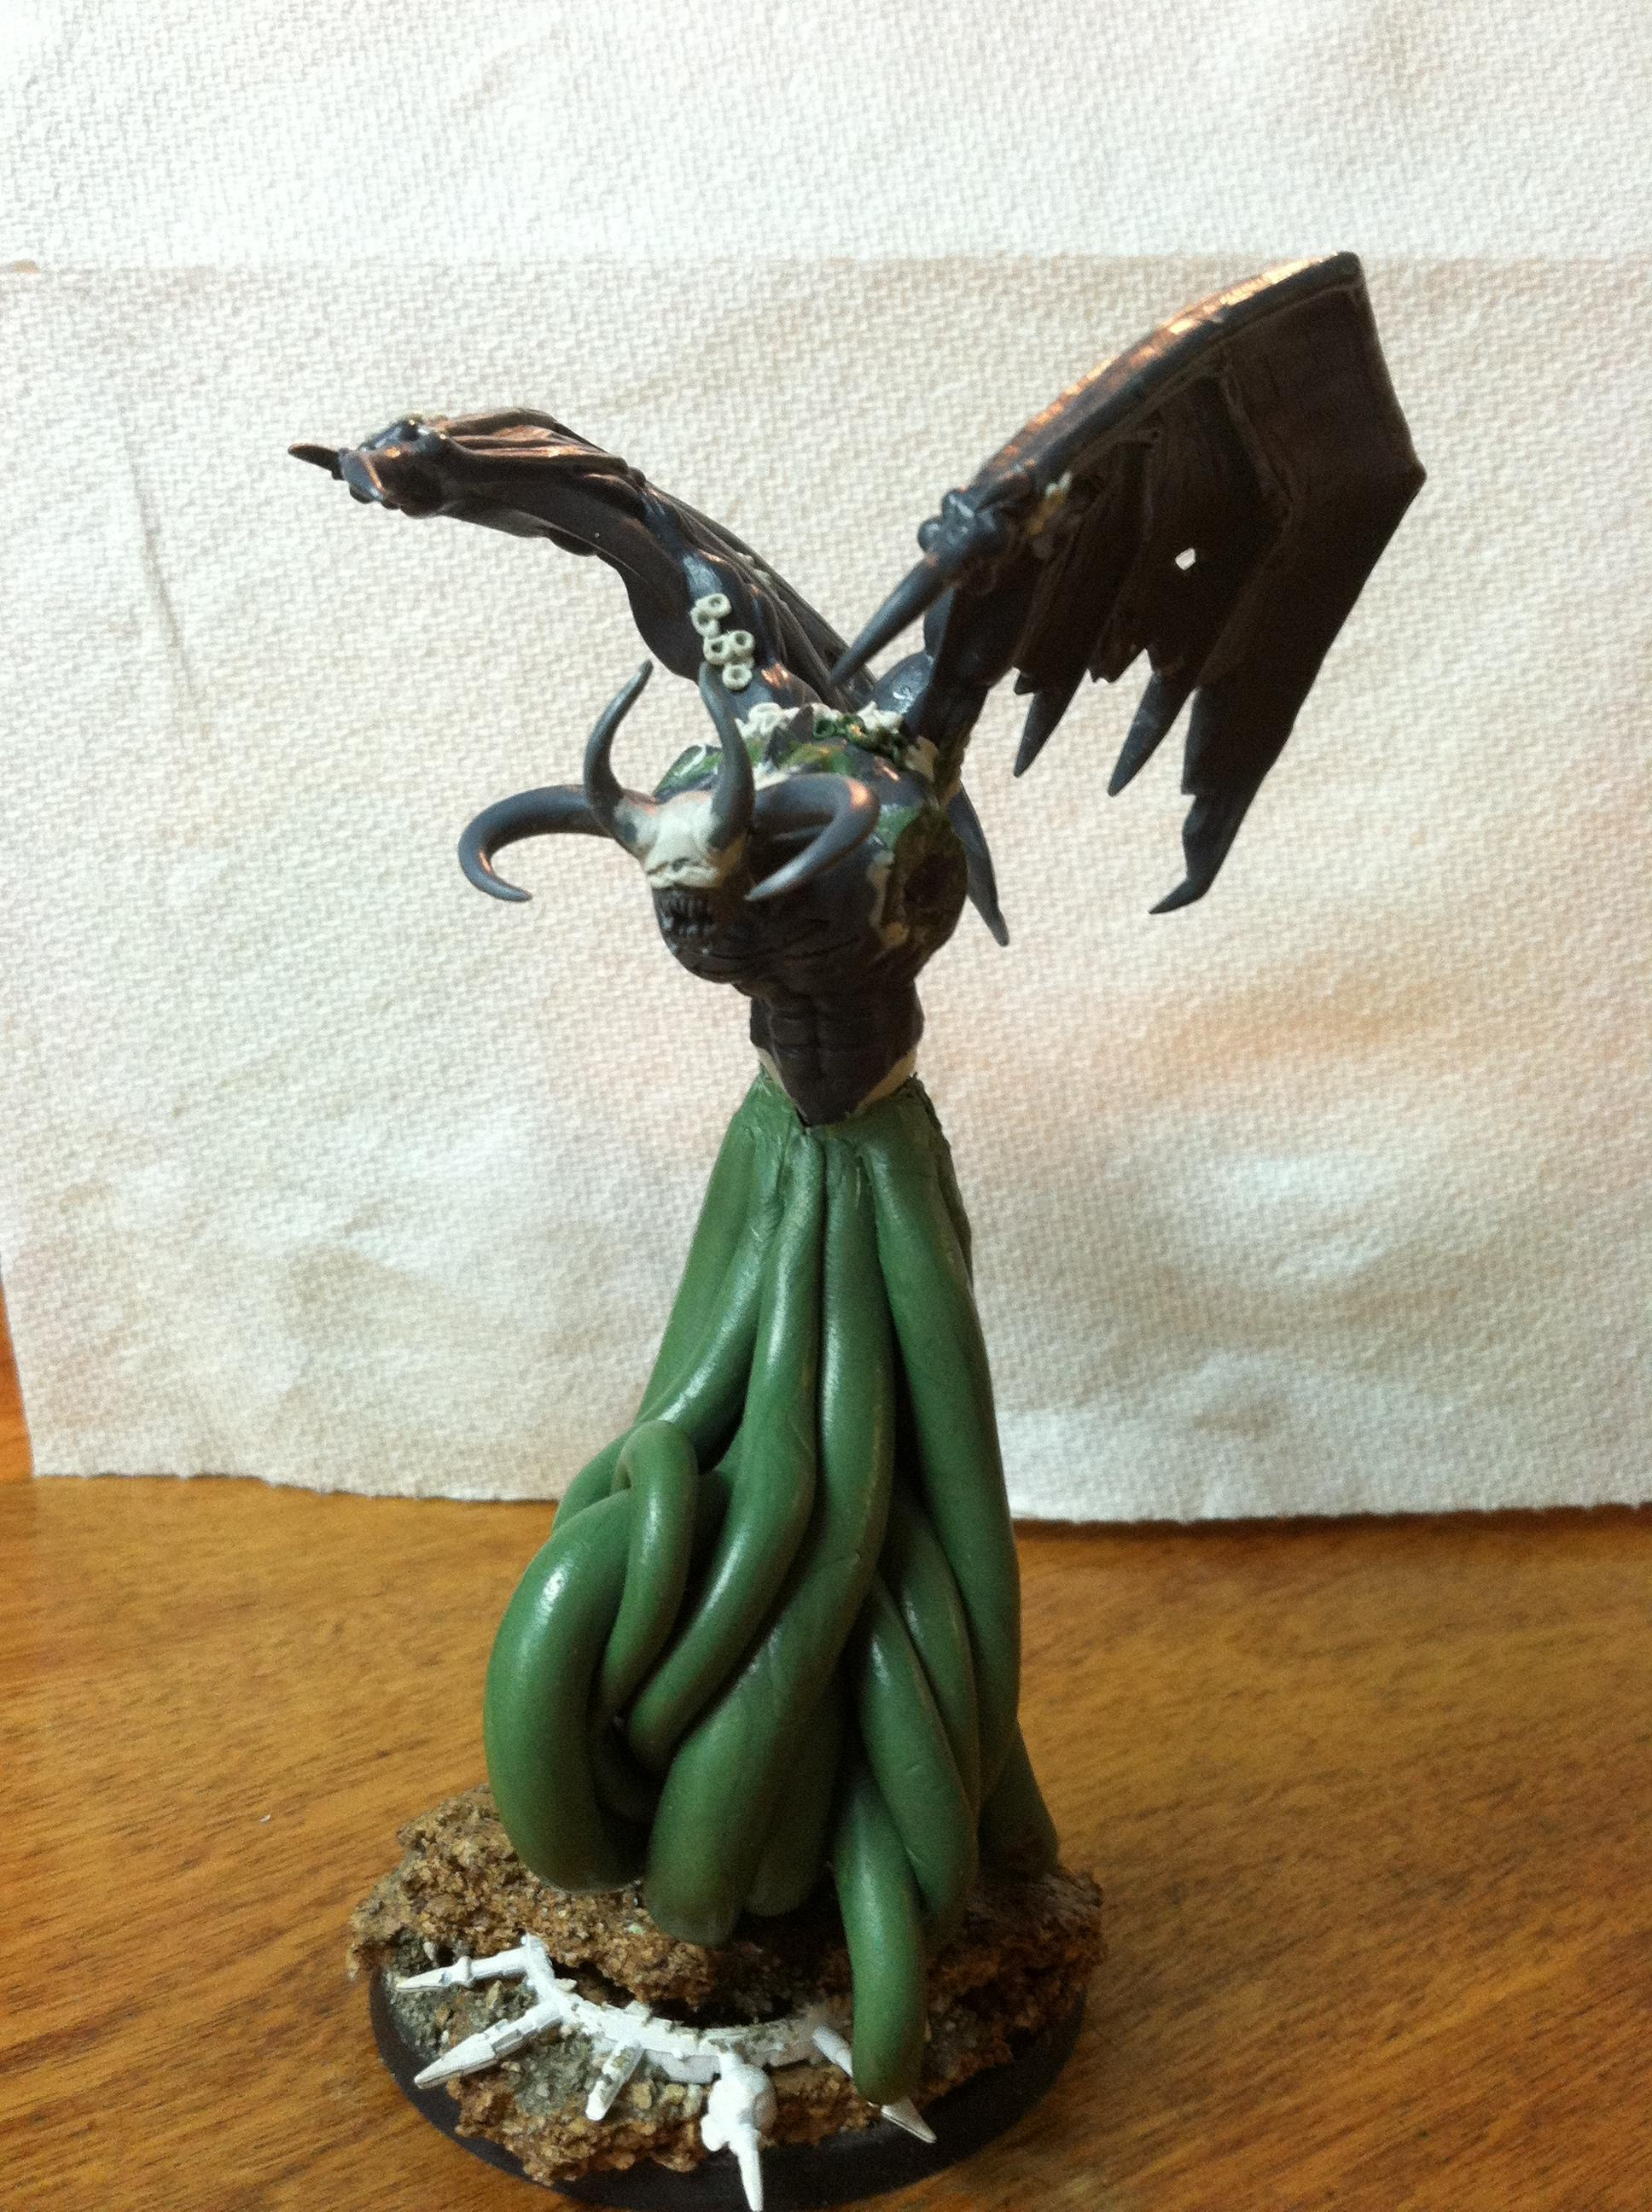 Cool, Custom Build, Daemons, Flying, Greenstuff, Prince, Tentacle, Warhammer 40,000, Winged, Work In Progress